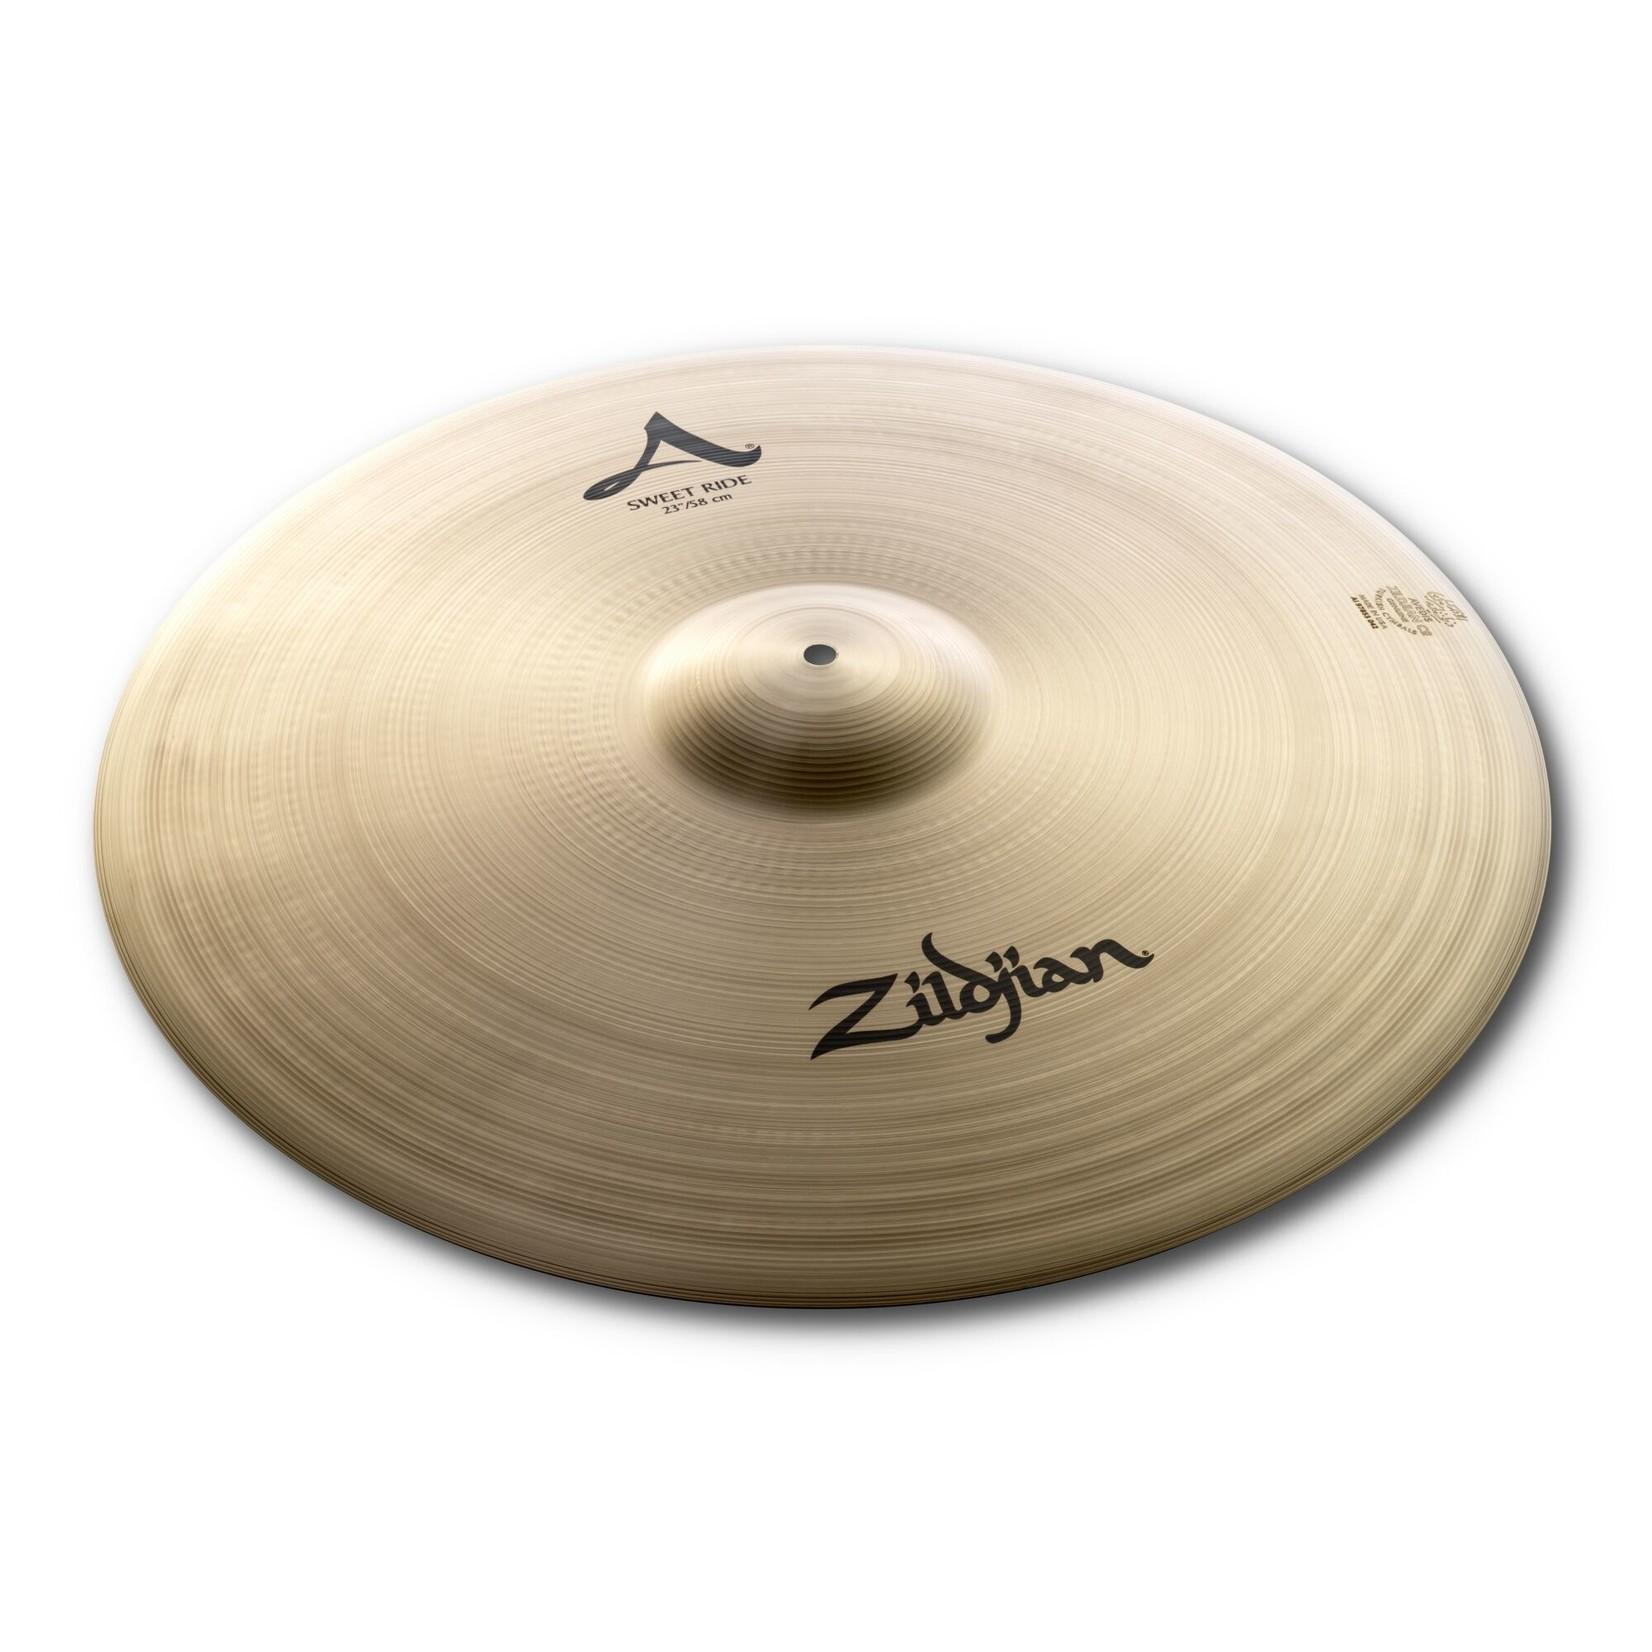 "Zildjian Zildjian 23"" A Zildjian Sweet Ride"